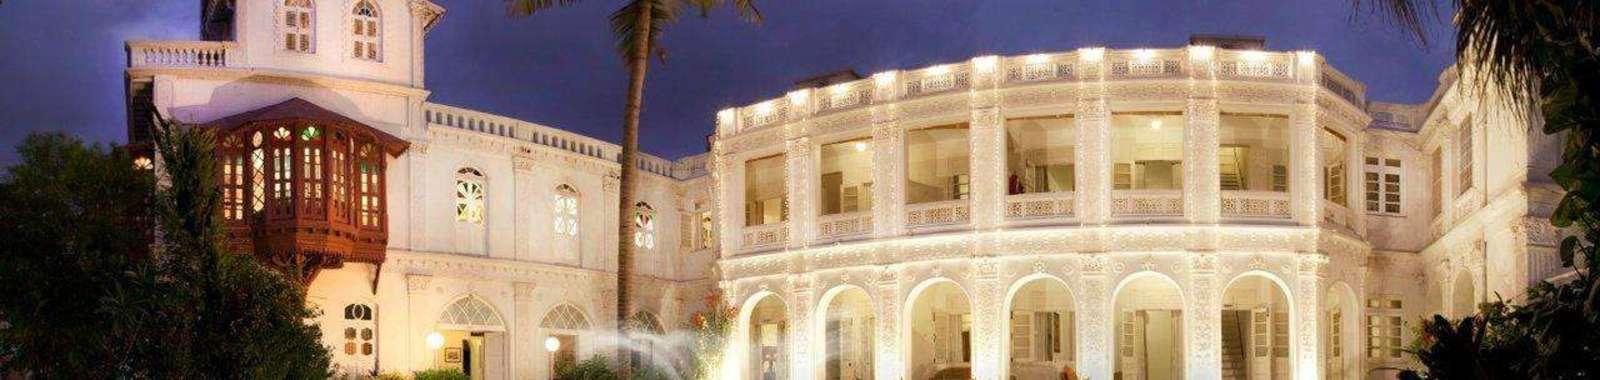 Divan's Bungalow, Ahmedabad - Heritage hotel in Gujarat, India